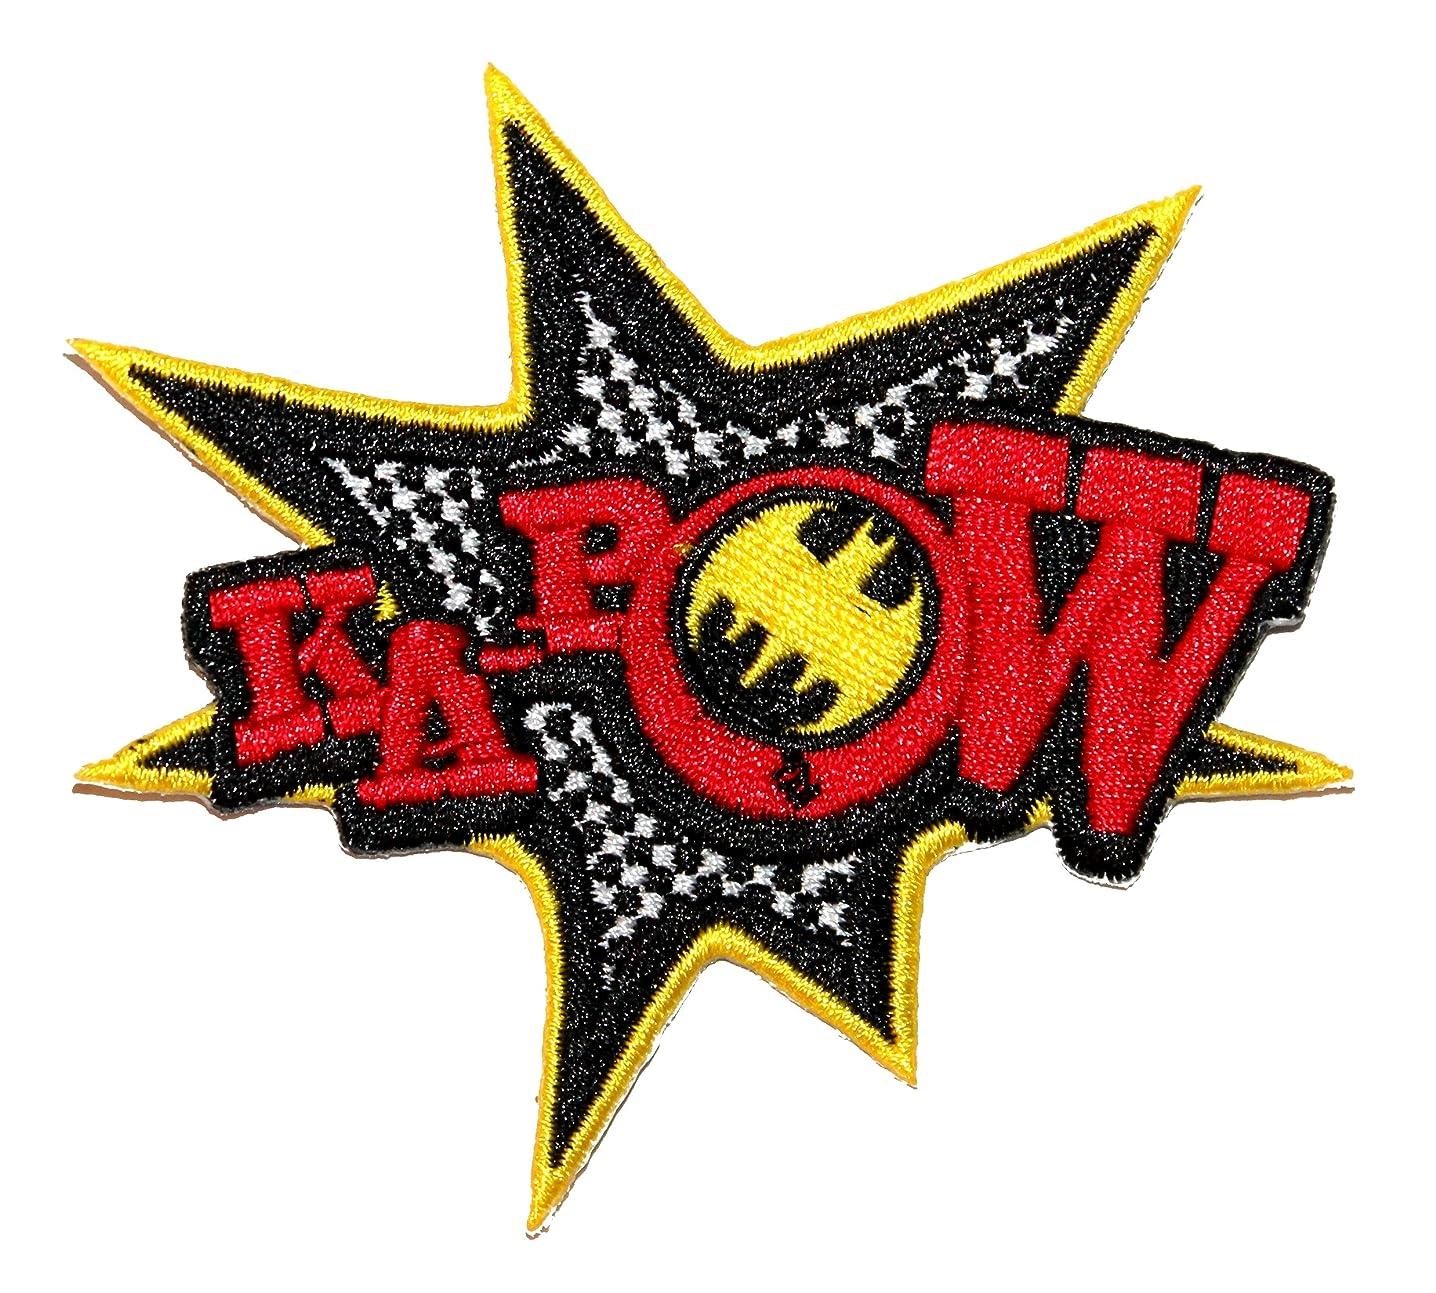 Ka-Pow Classic Retro Batman Effect DC Comics Superhero Iron On Applique Patch